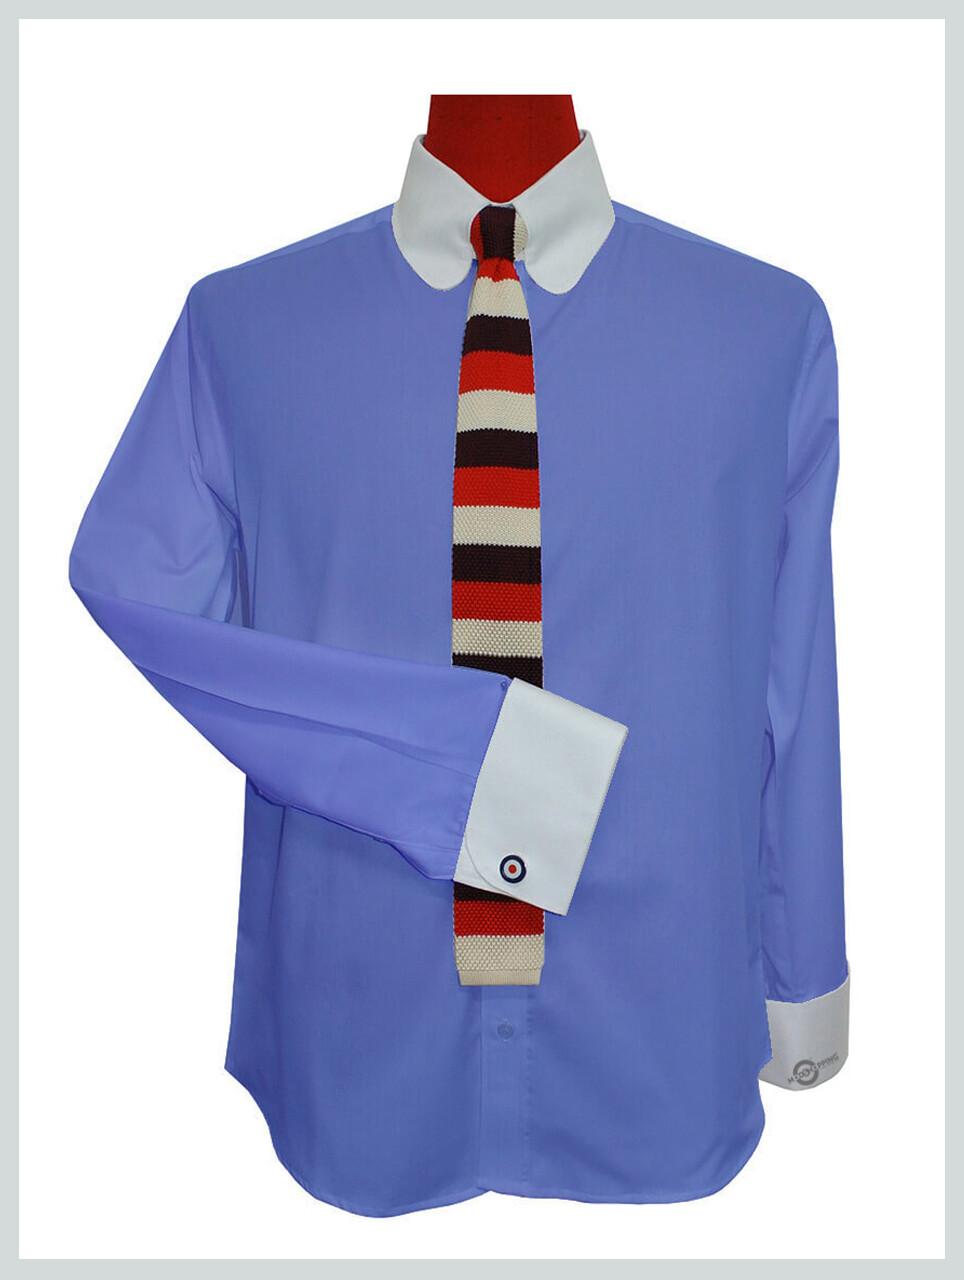 Tab Collar Shirt|  Sky Blue Mod Shirt